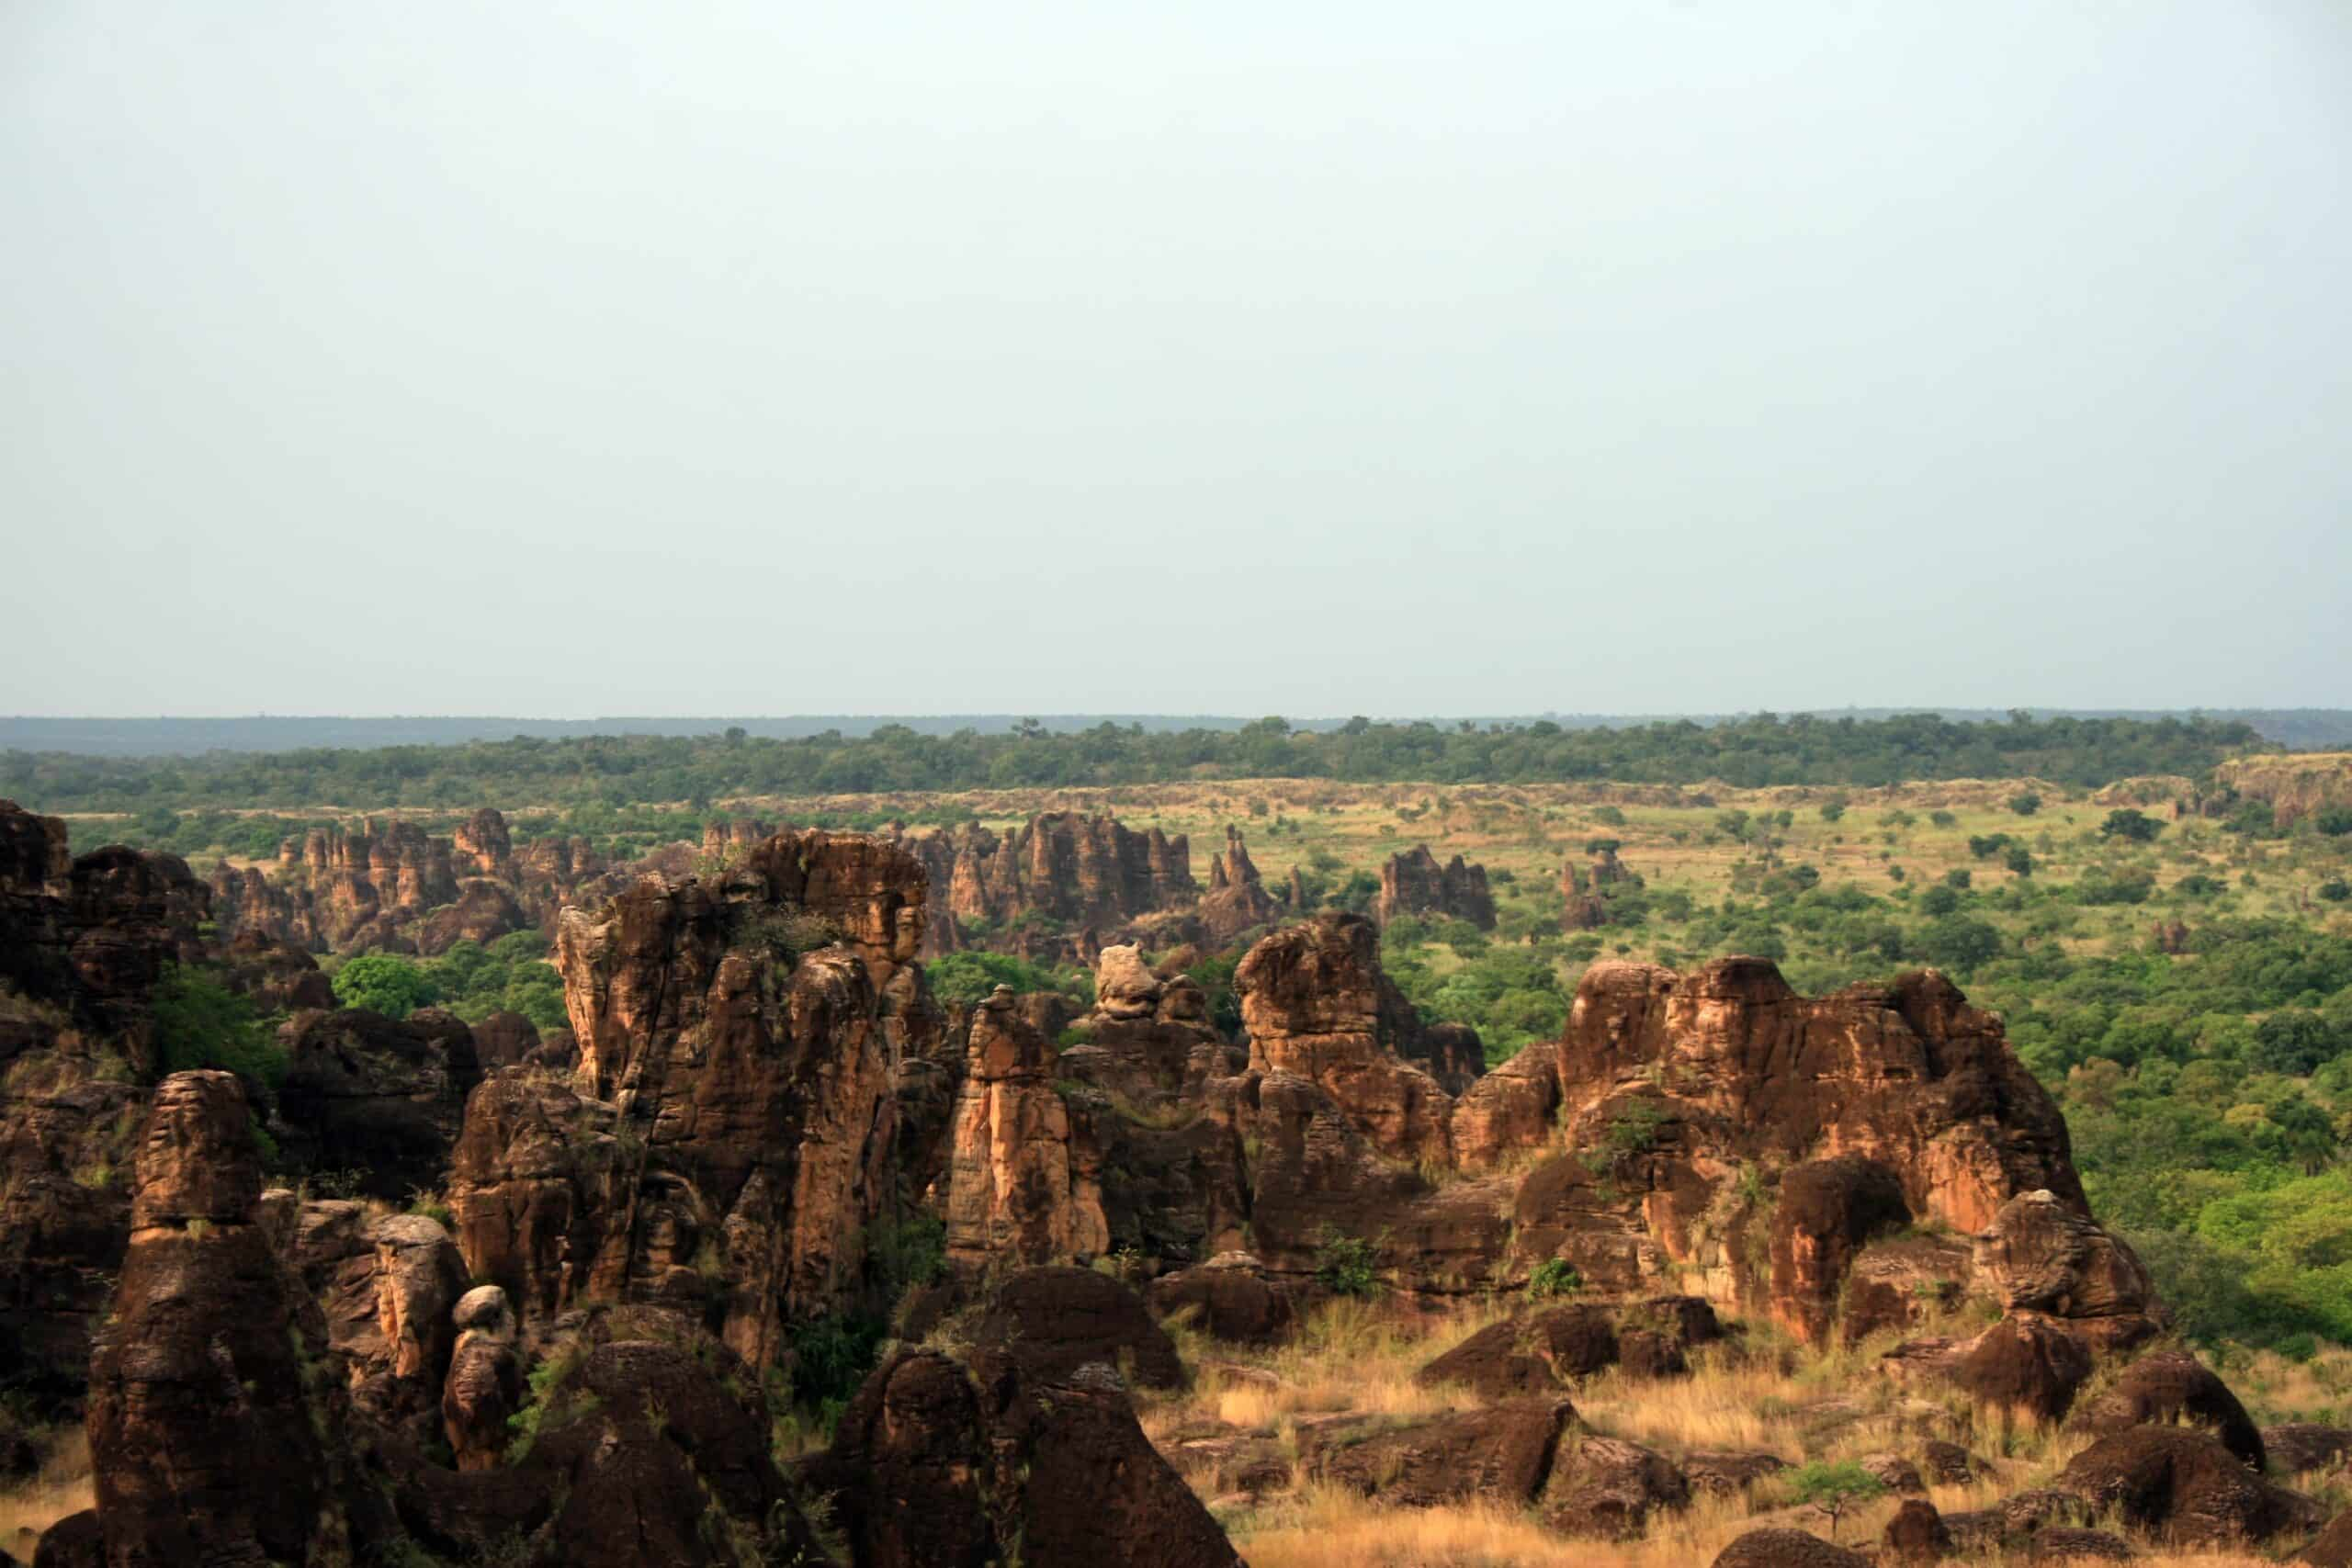 Burkina Faso Reisebericht - Gruppenreise